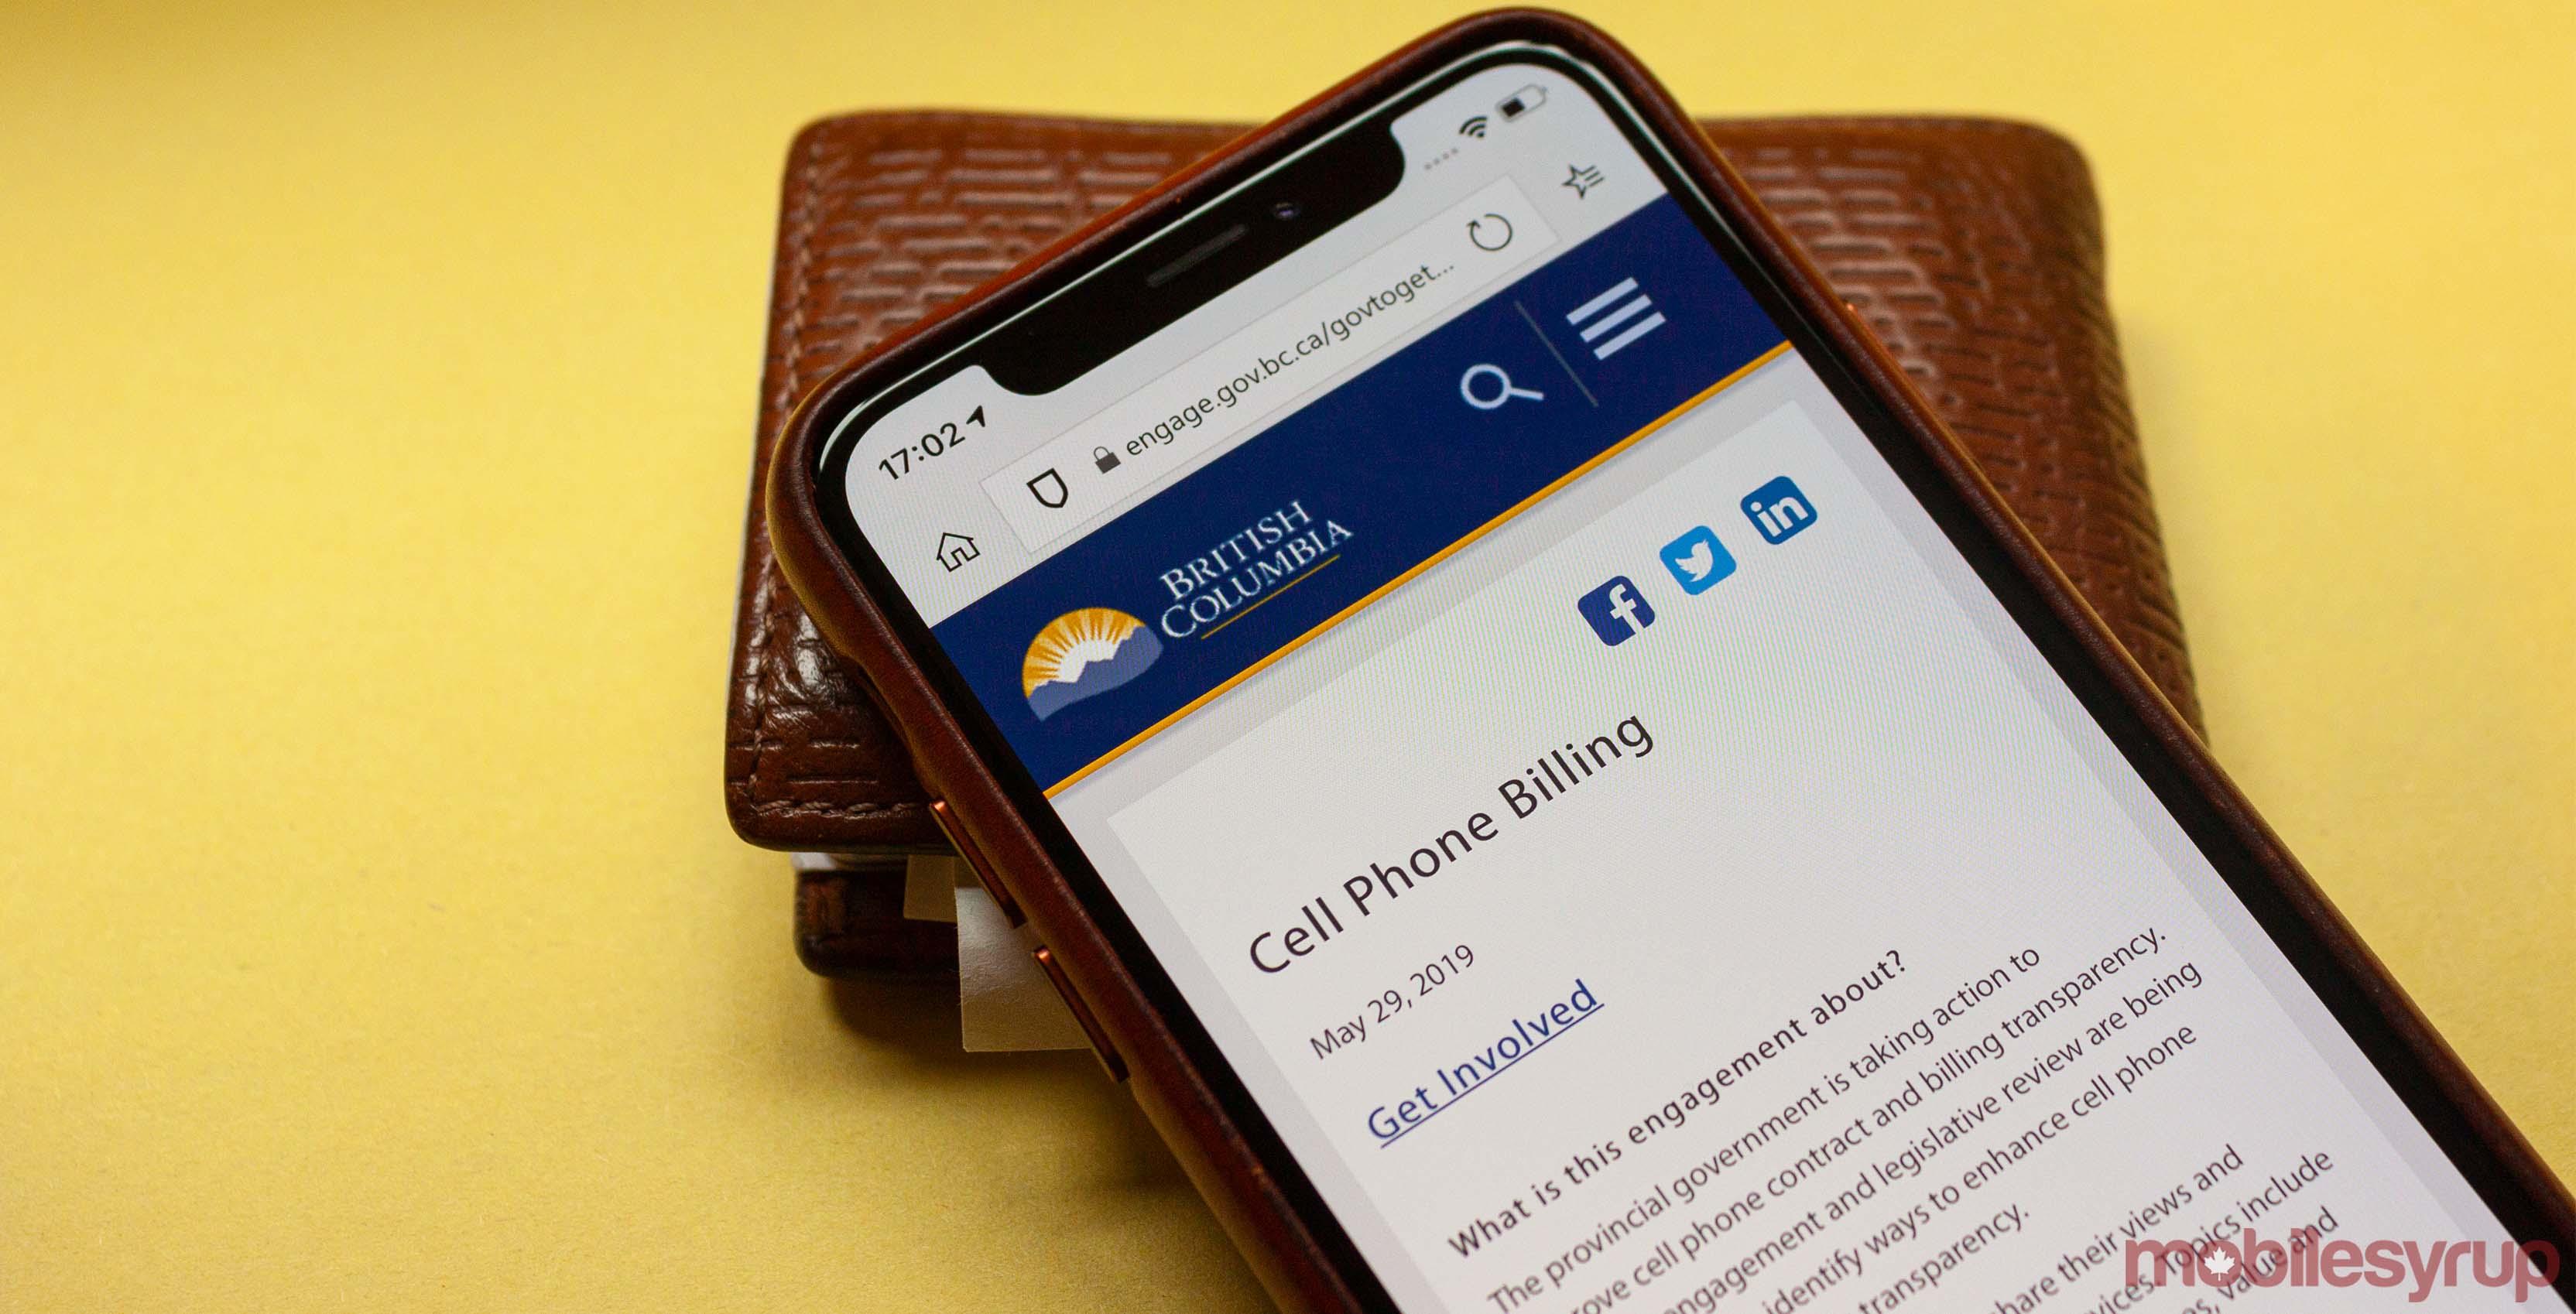 B.C. cellphone billing survey